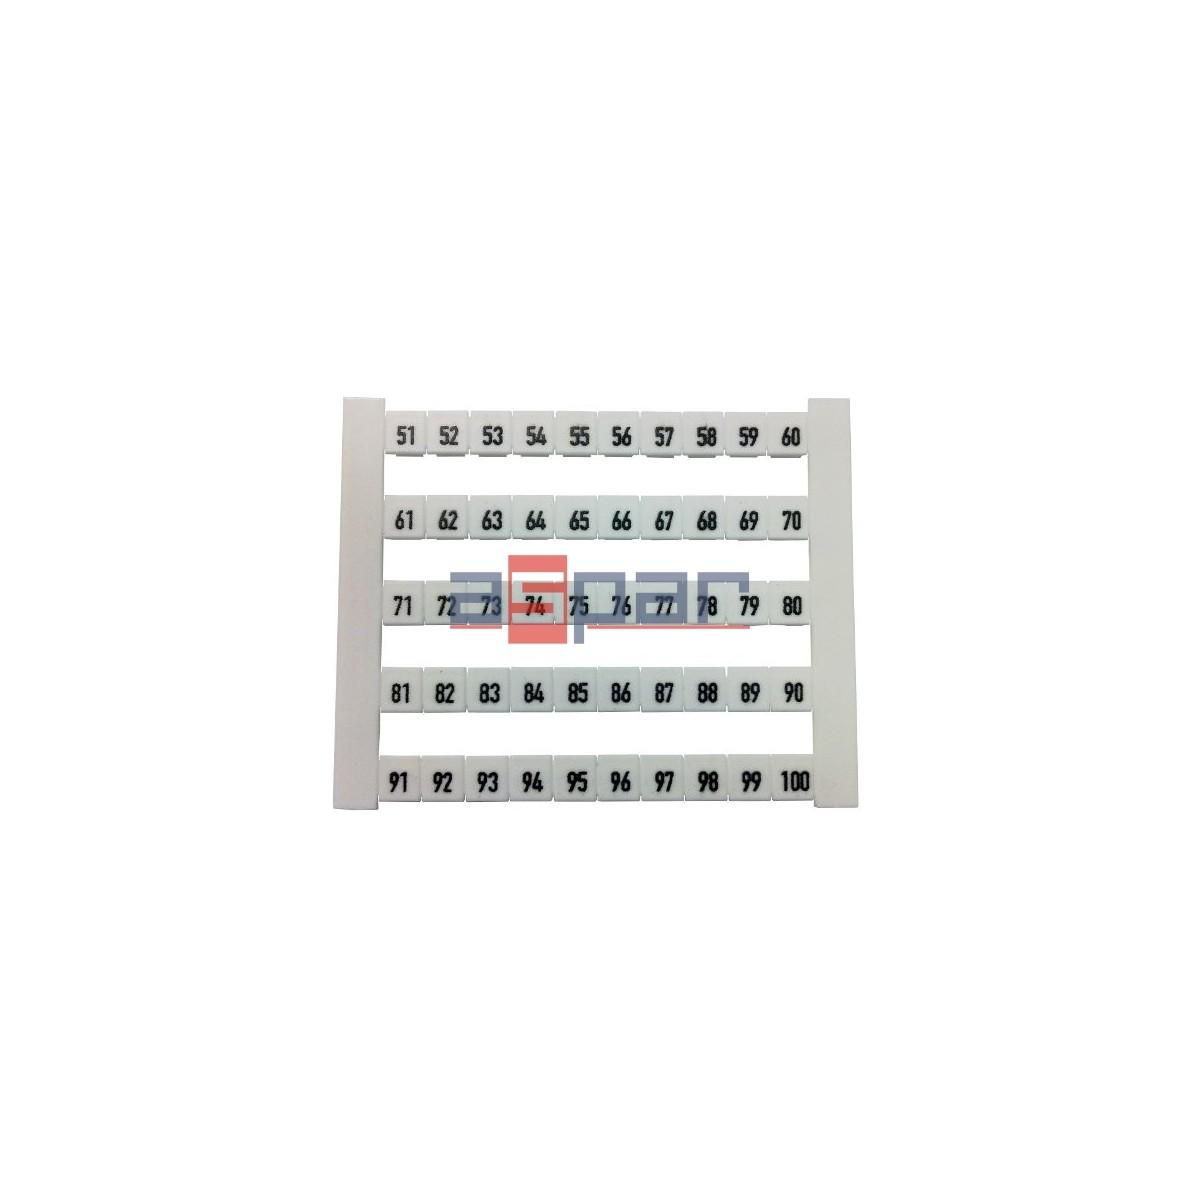 Oznacznik poziomy DEK 5 FW 51-100, 00473460051